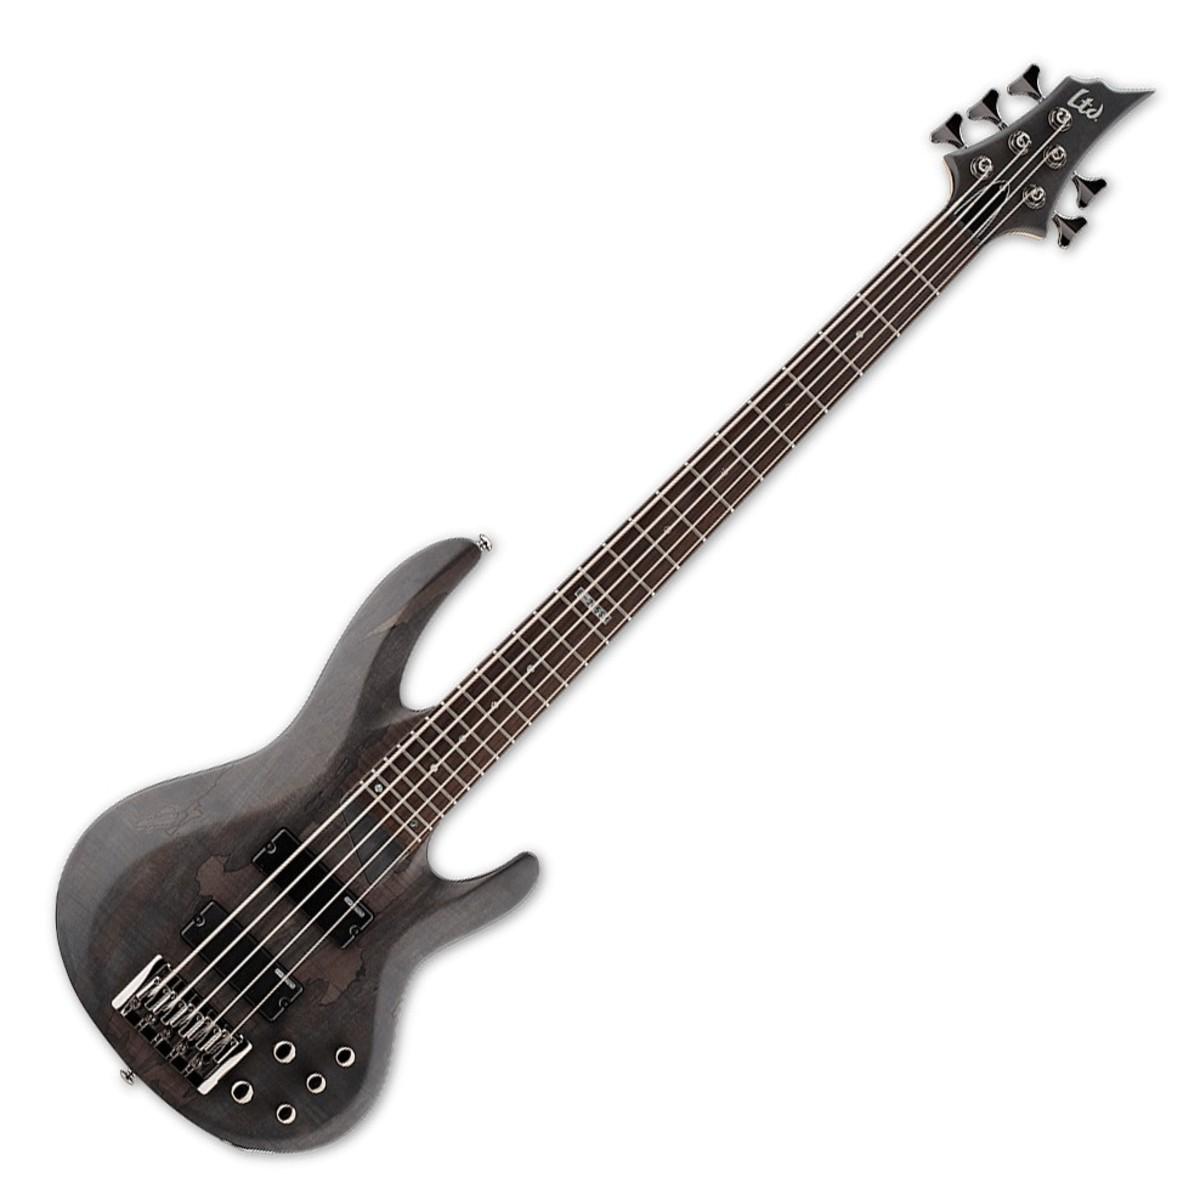 esp ltd b 205sm 5 string bass guitar see thru black satin at. Black Bedroom Furniture Sets. Home Design Ideas